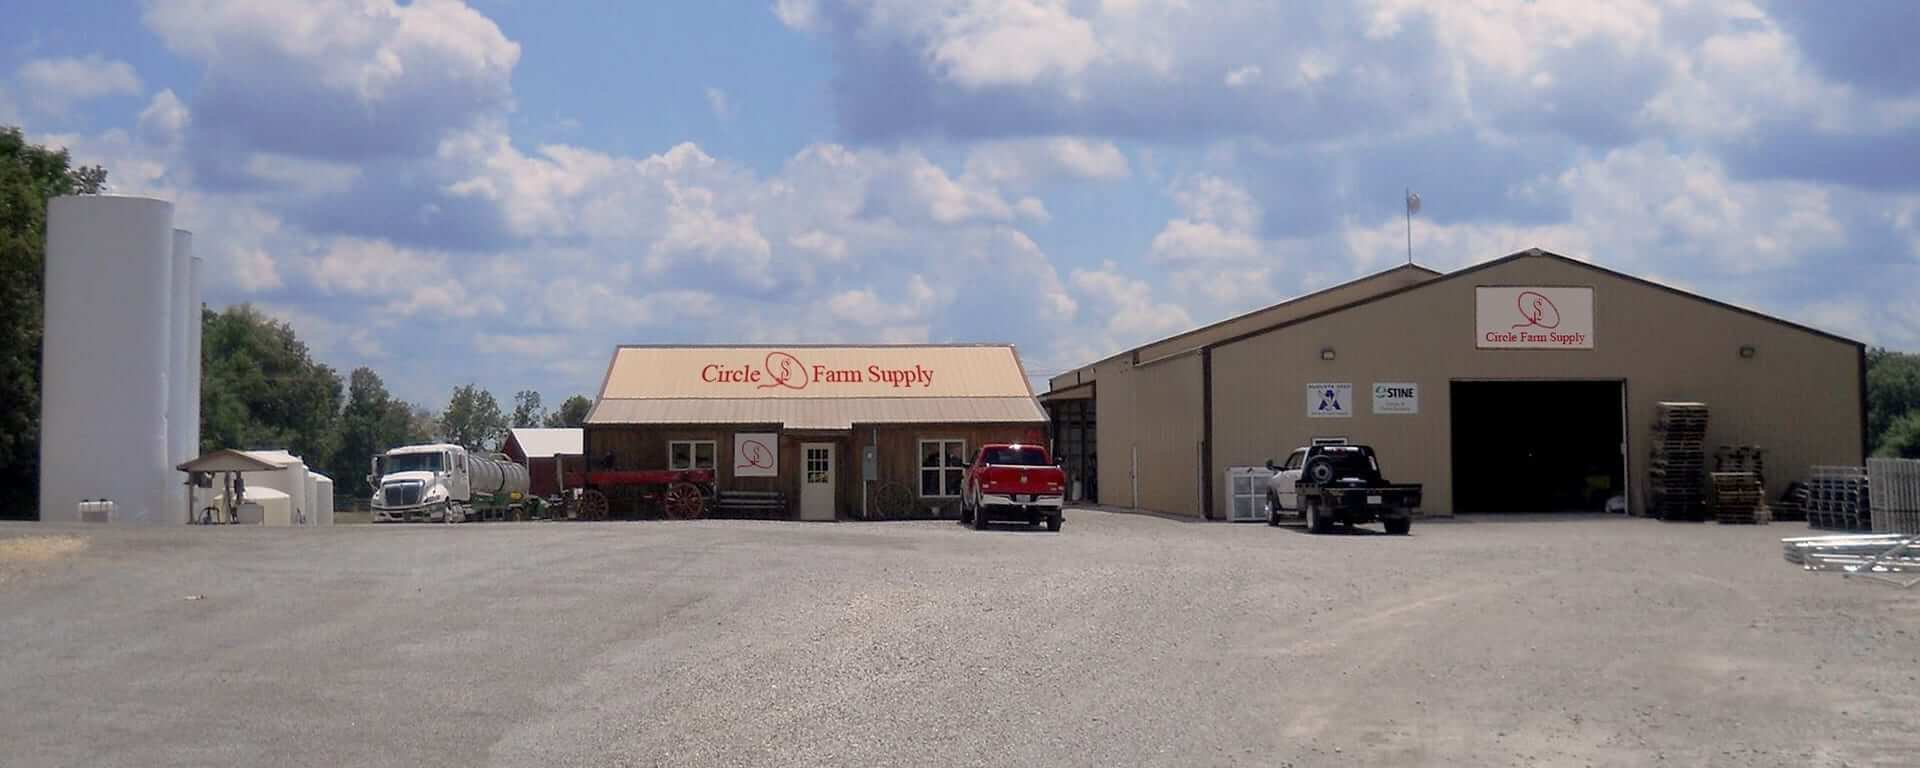 Circle S Farm facility